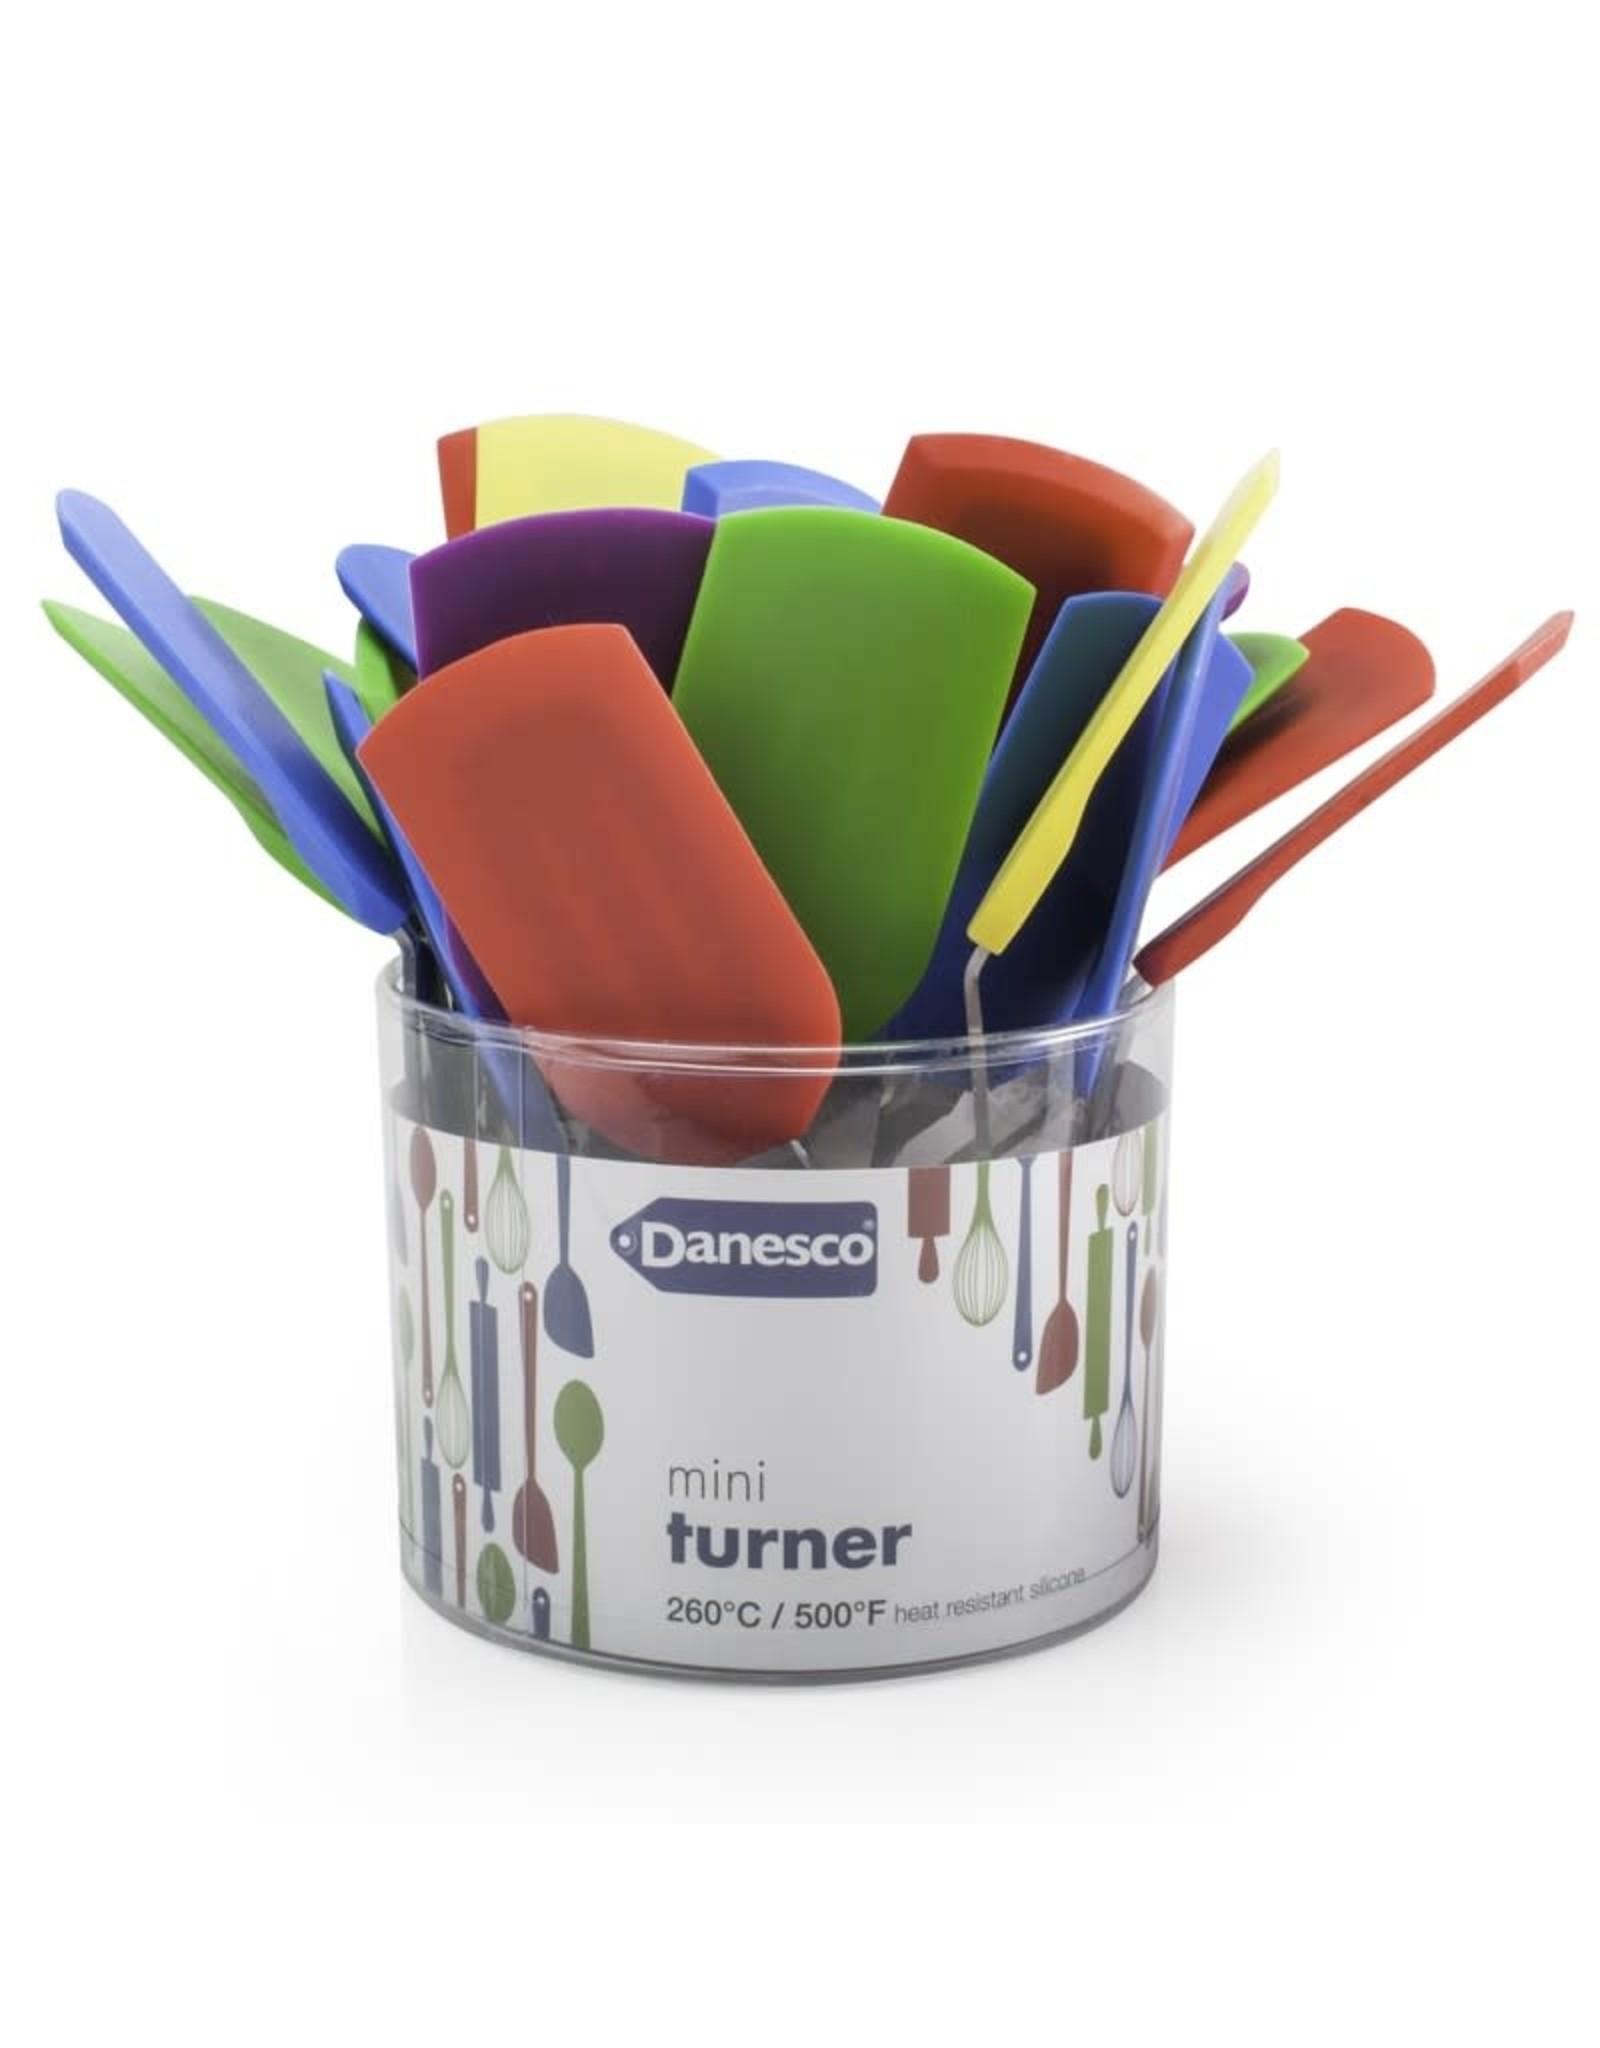 Danesco Danesco - Mini Turner